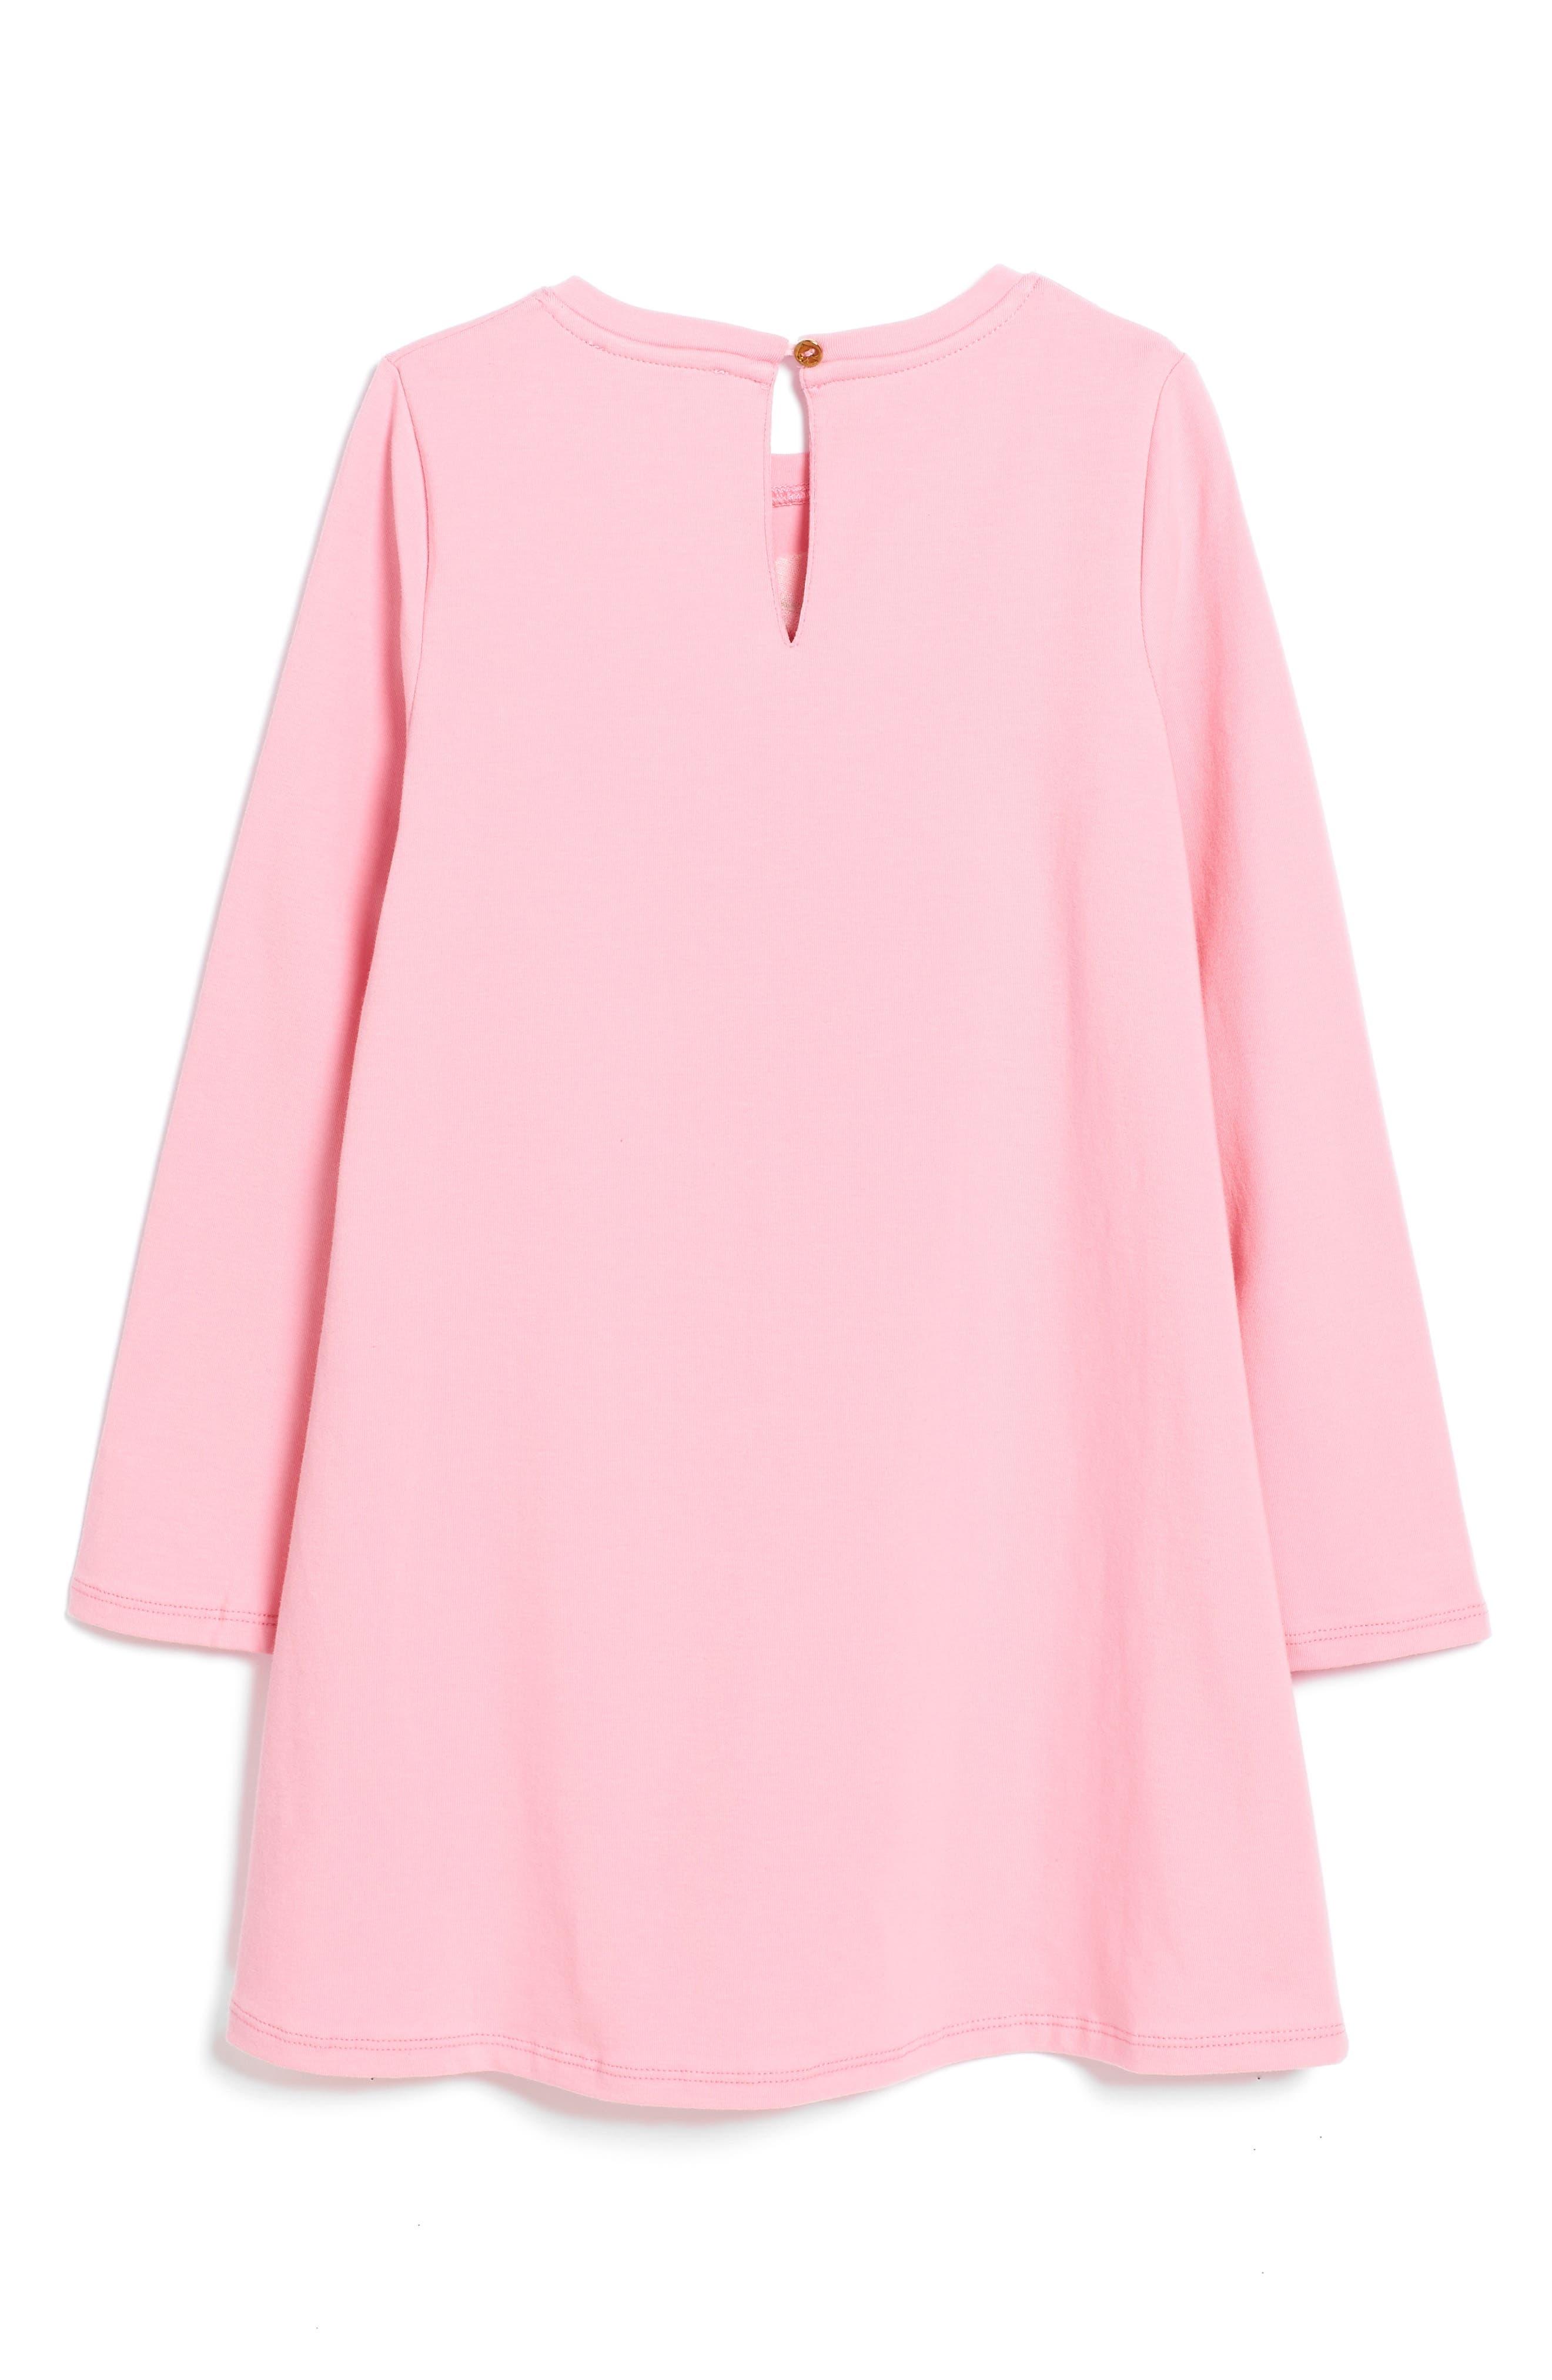 rose dress,                             Alternate thumbnail 2, color,                             660